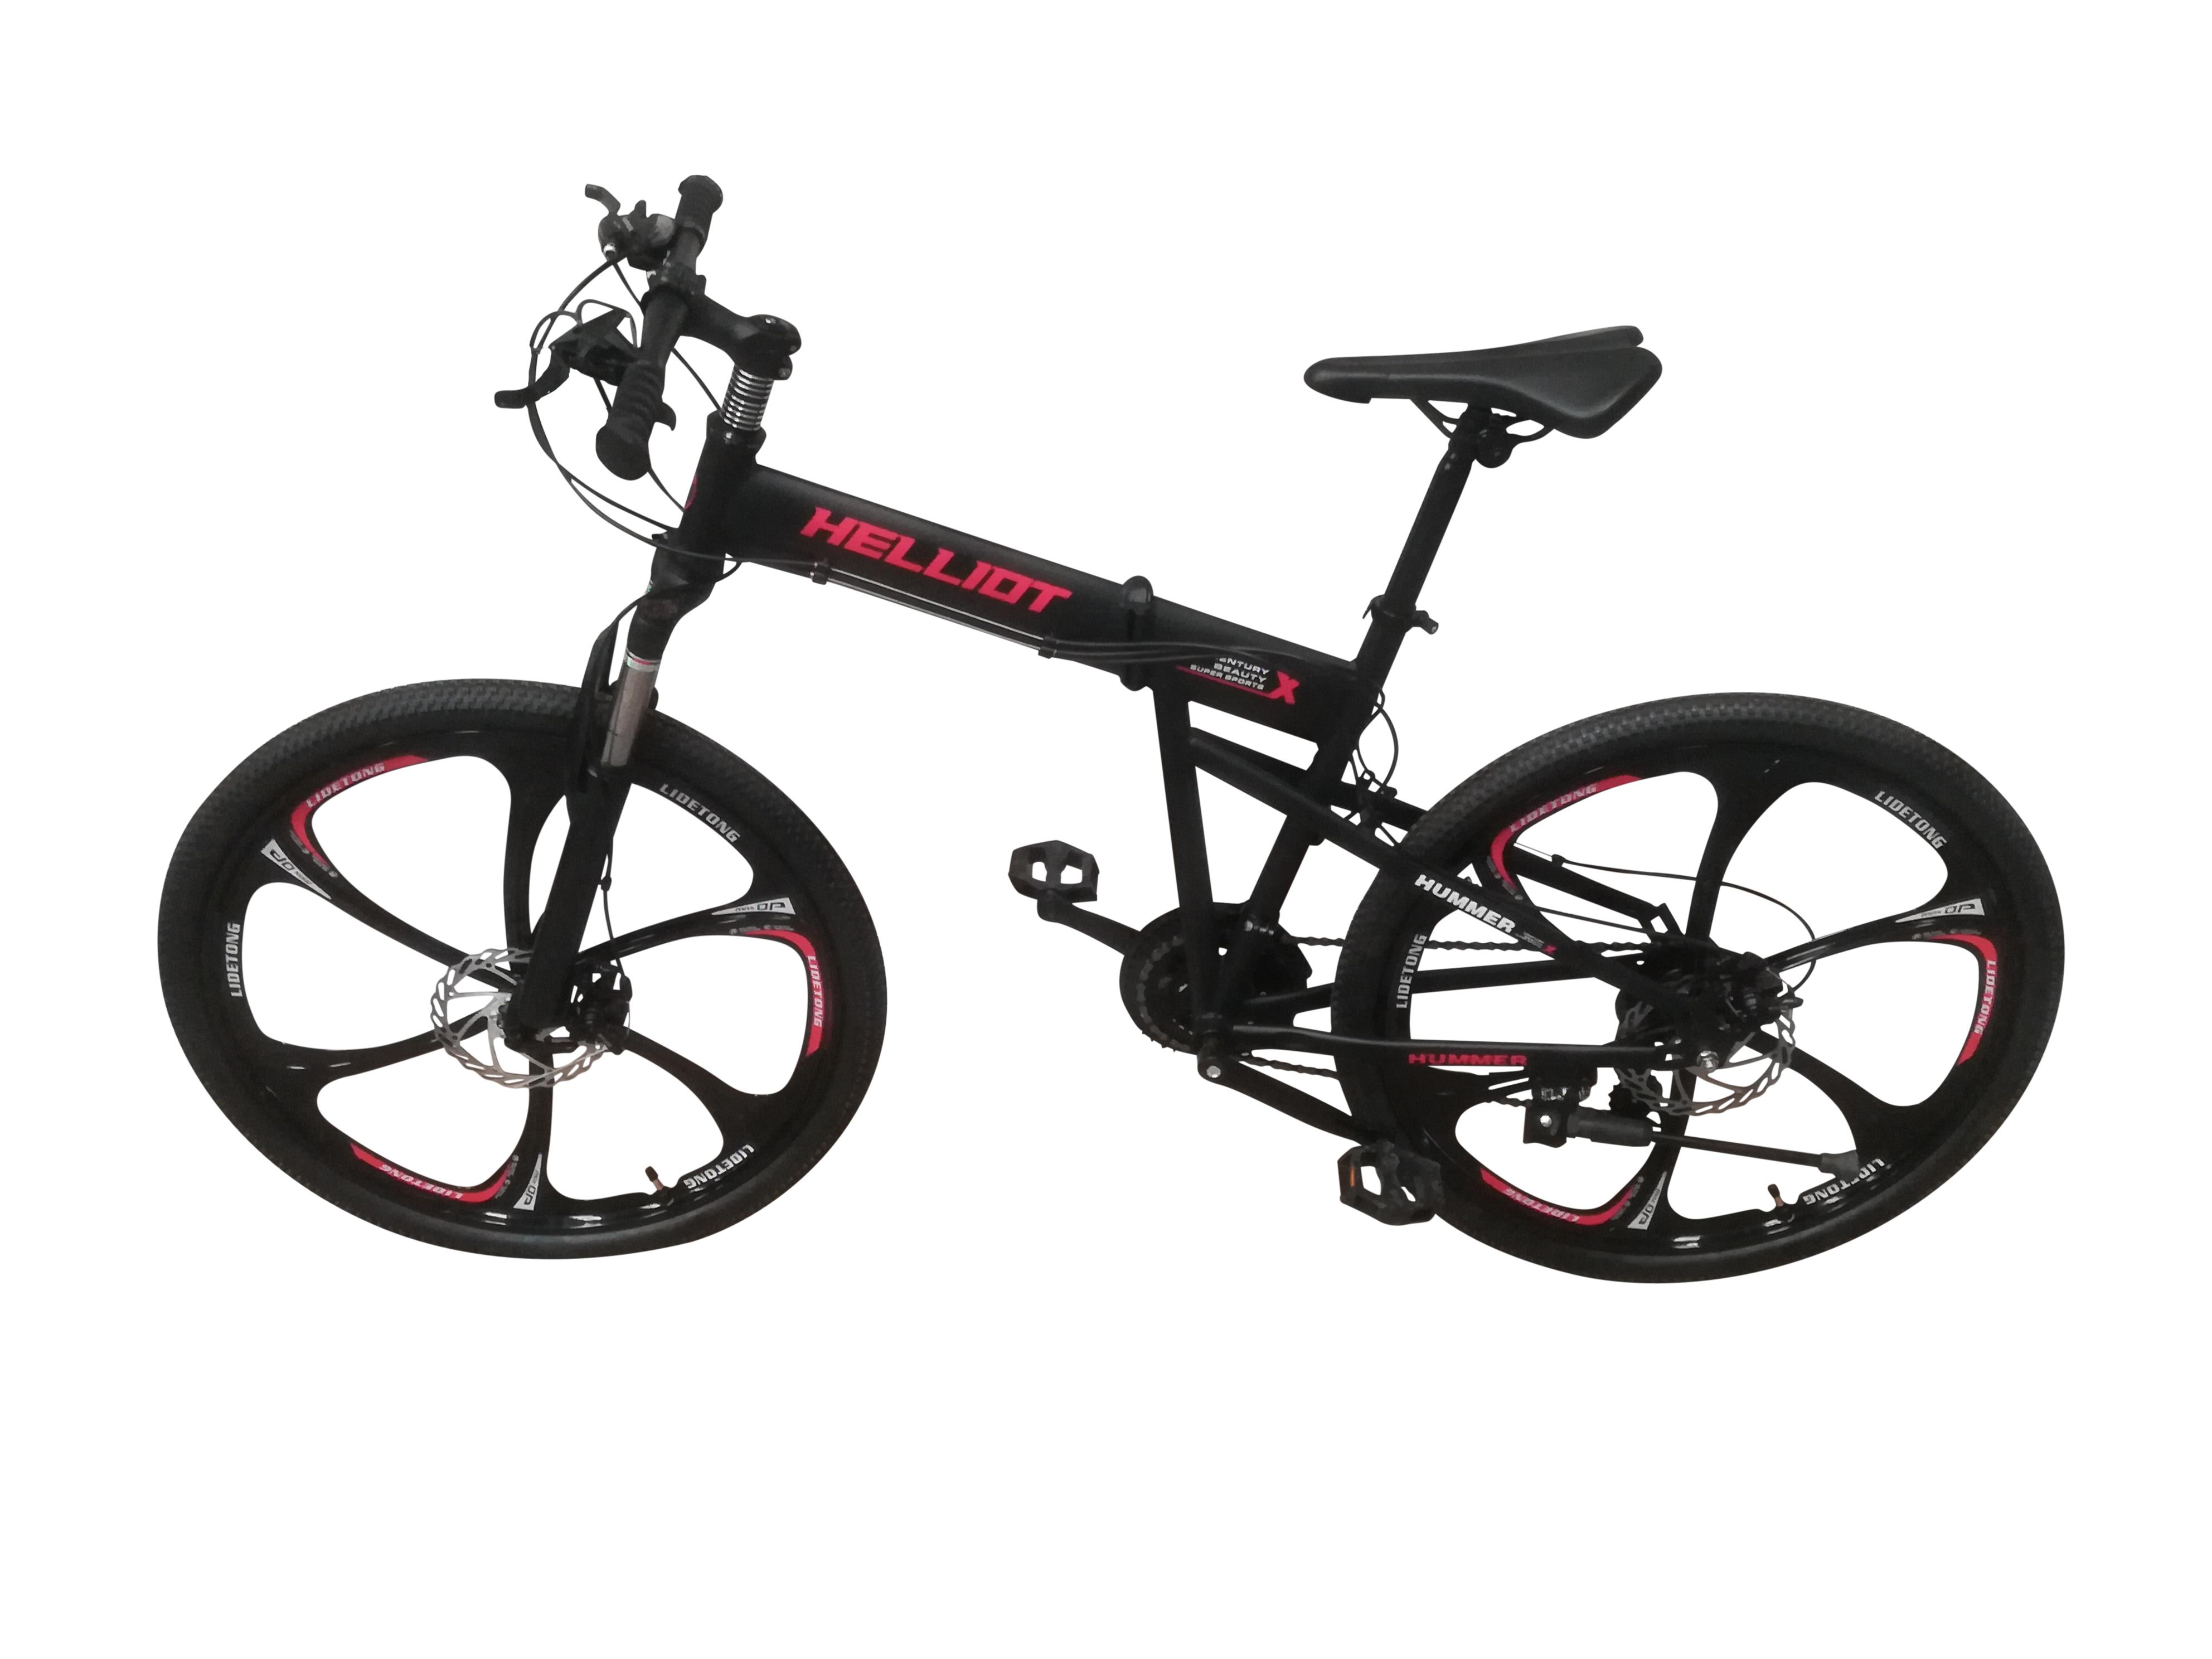 Folding Mountain Bike Helliot Hummer 14 | hummer bike sale